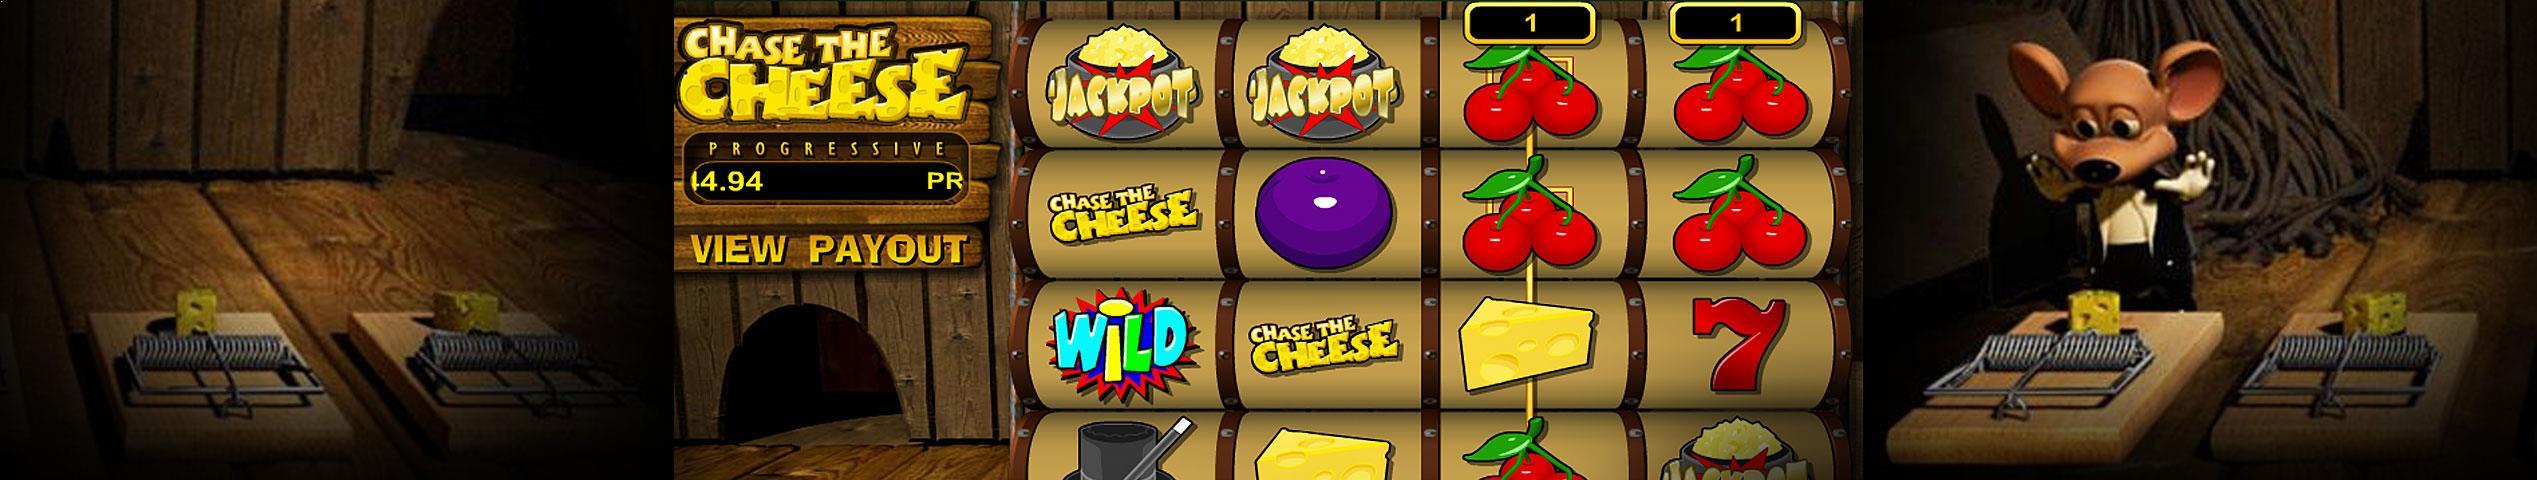 Chase the Cheese Multa Baft jocuri slot slider Betsoft